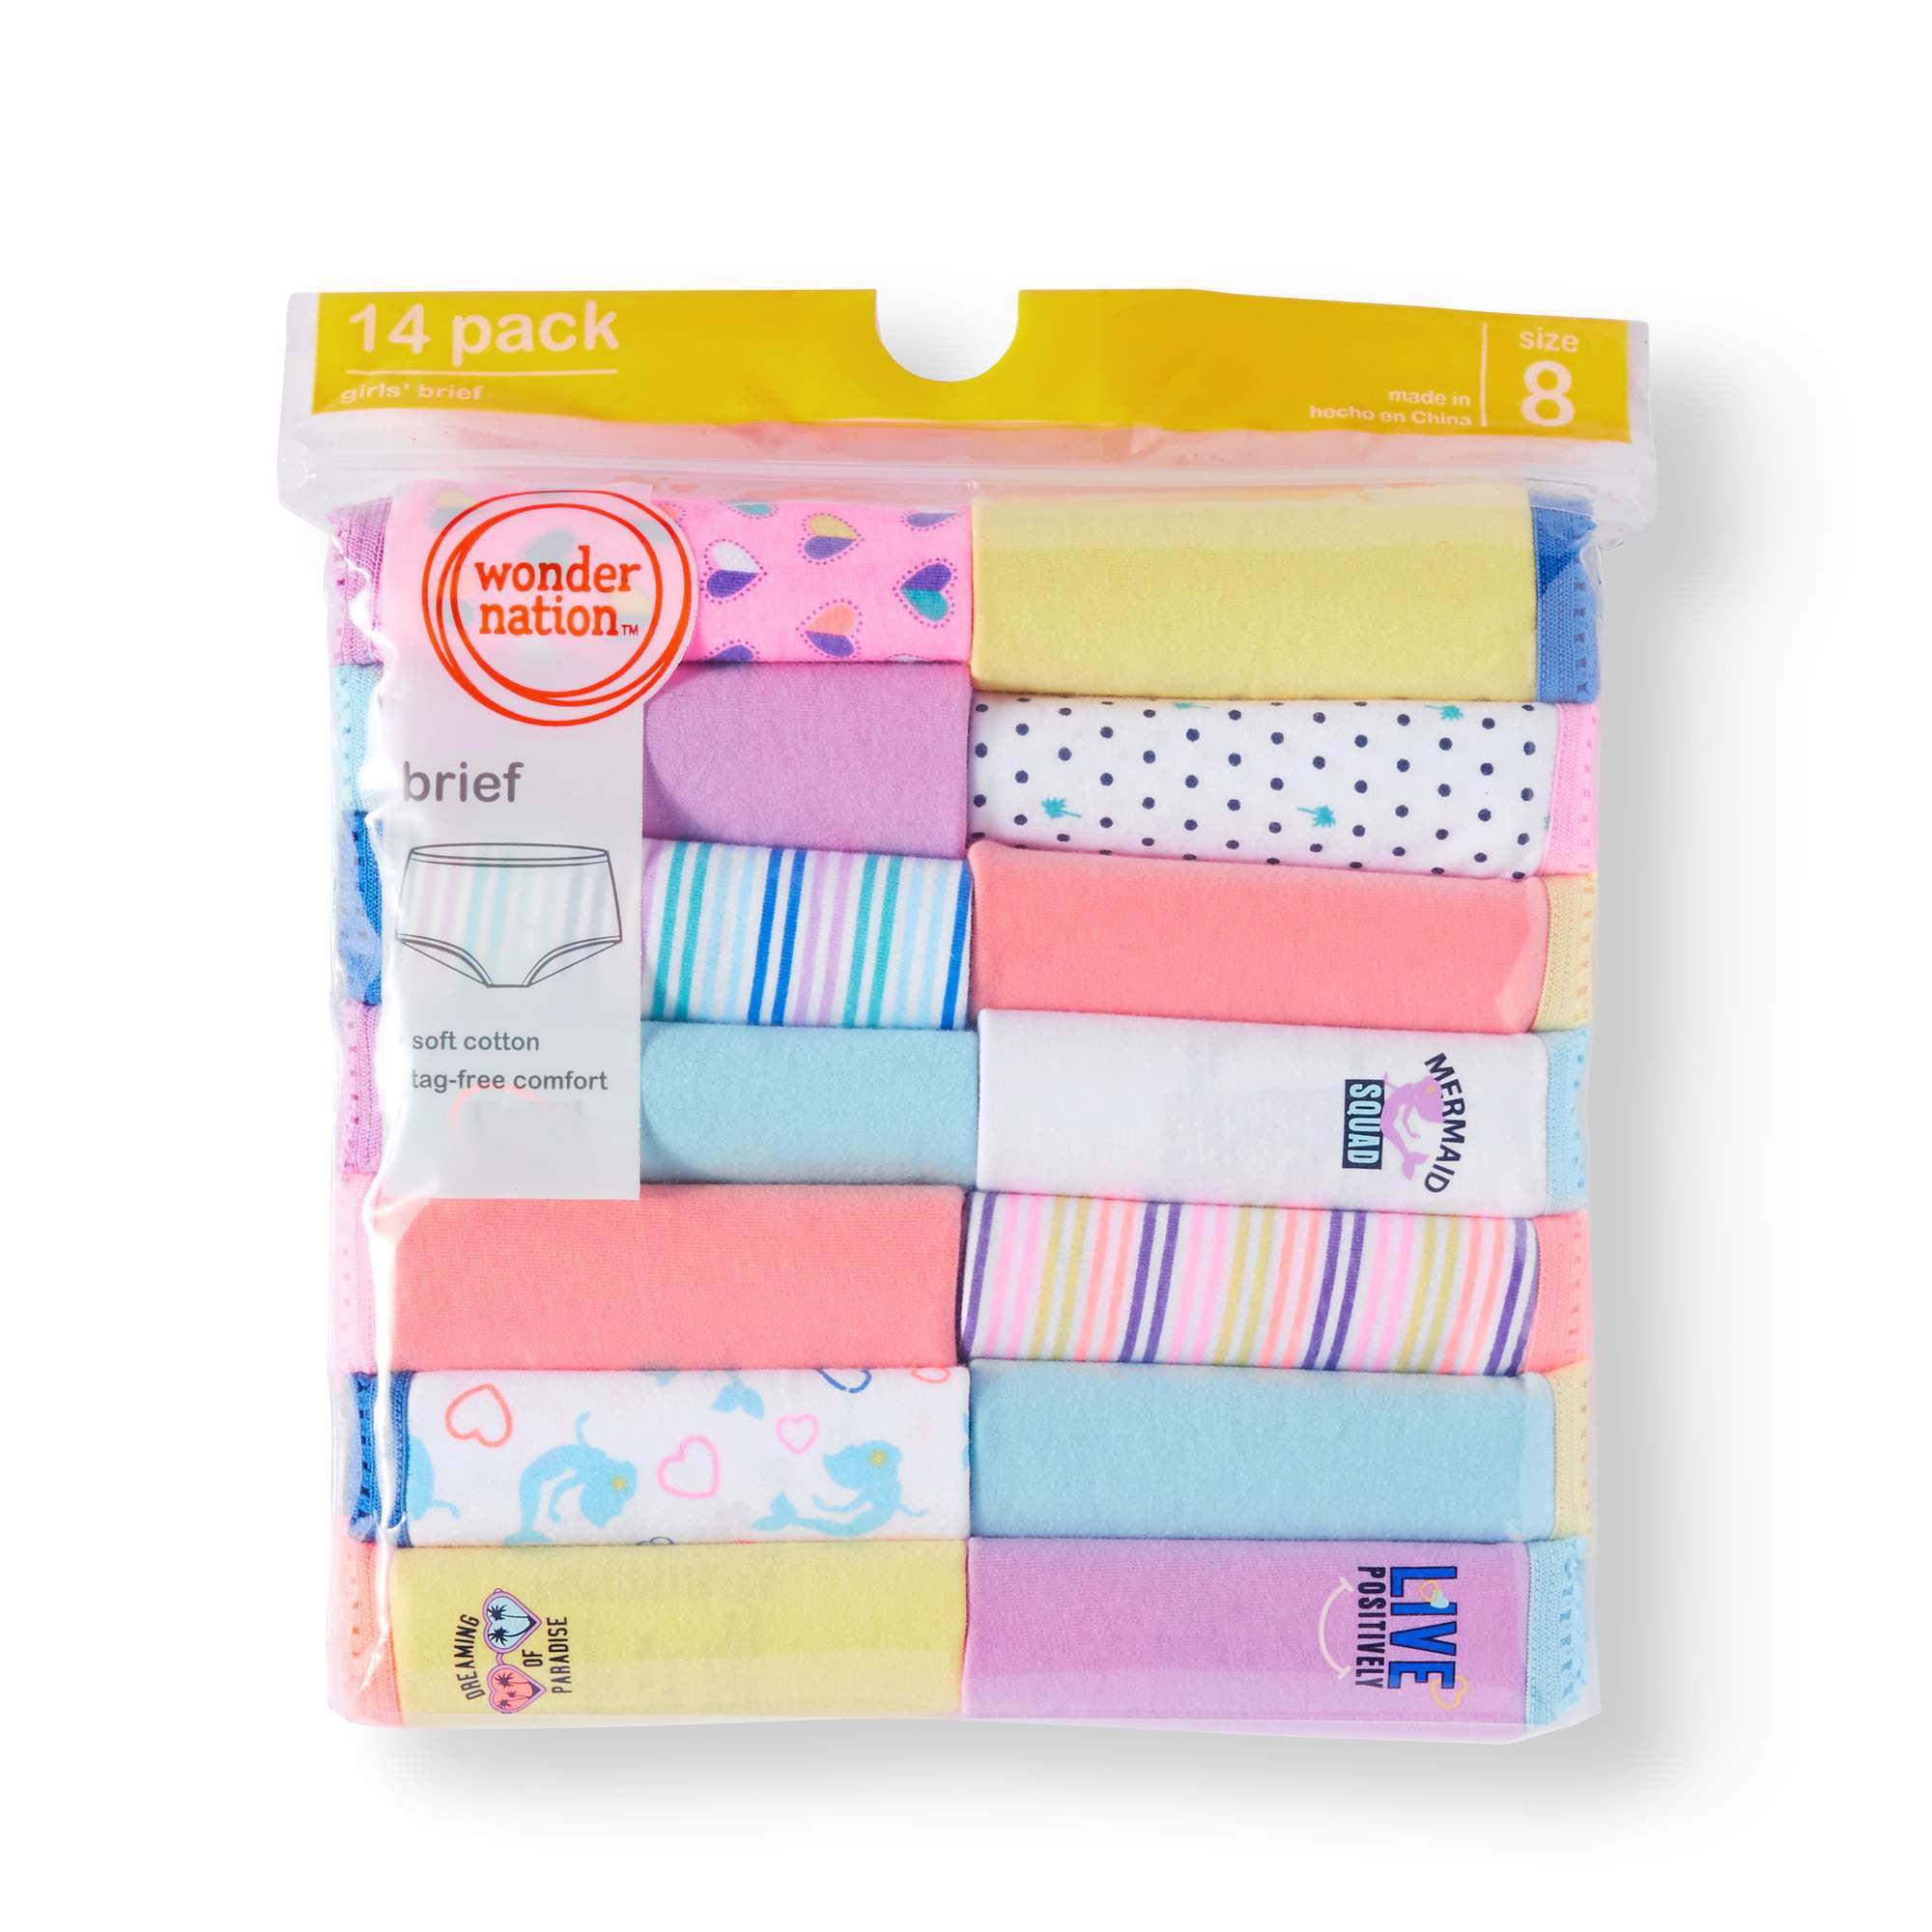 Wonder Nation Girls 100% Cotton Brief Panty, 14 pack